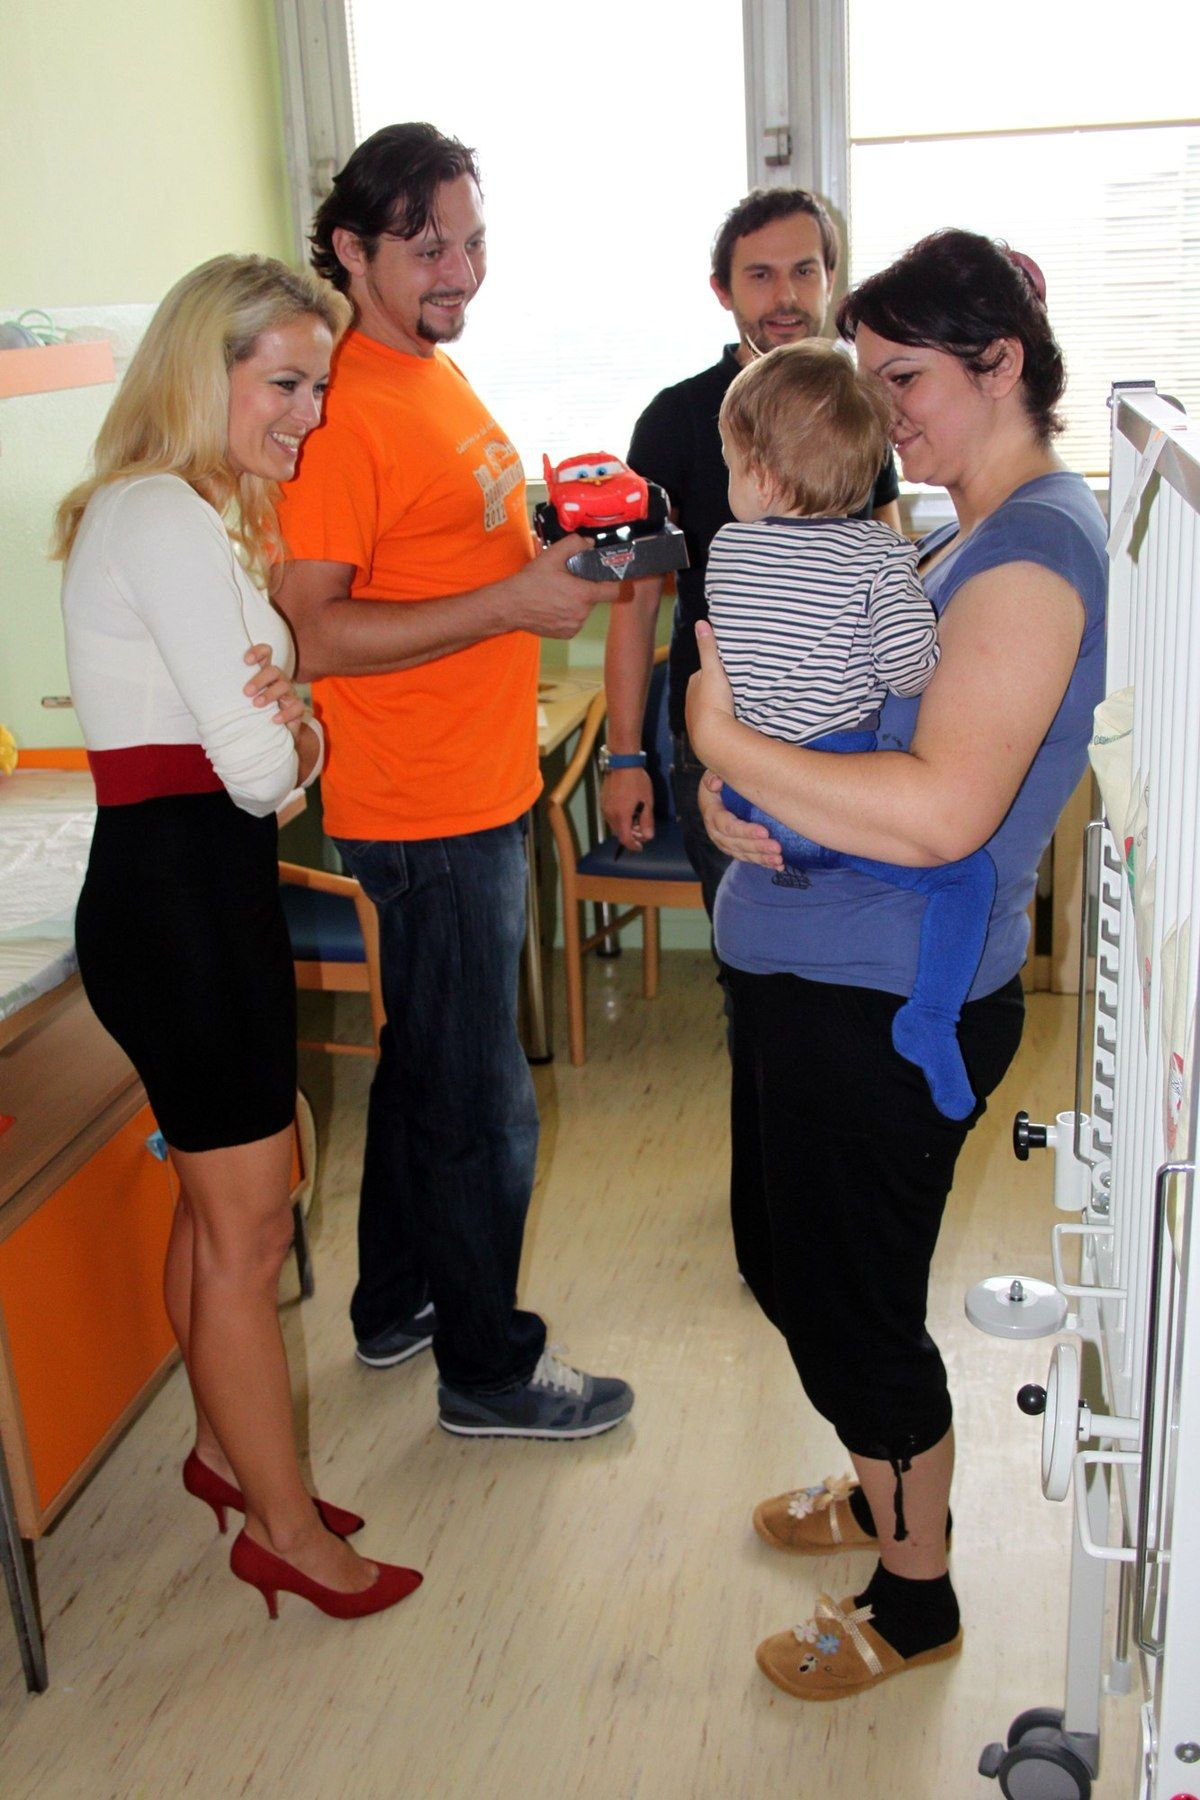 Herec Lukáš Latinák a moderátorka Jana Hospodárová diskutujú s mamičkou malého pacienta z Detského kardiocentra.